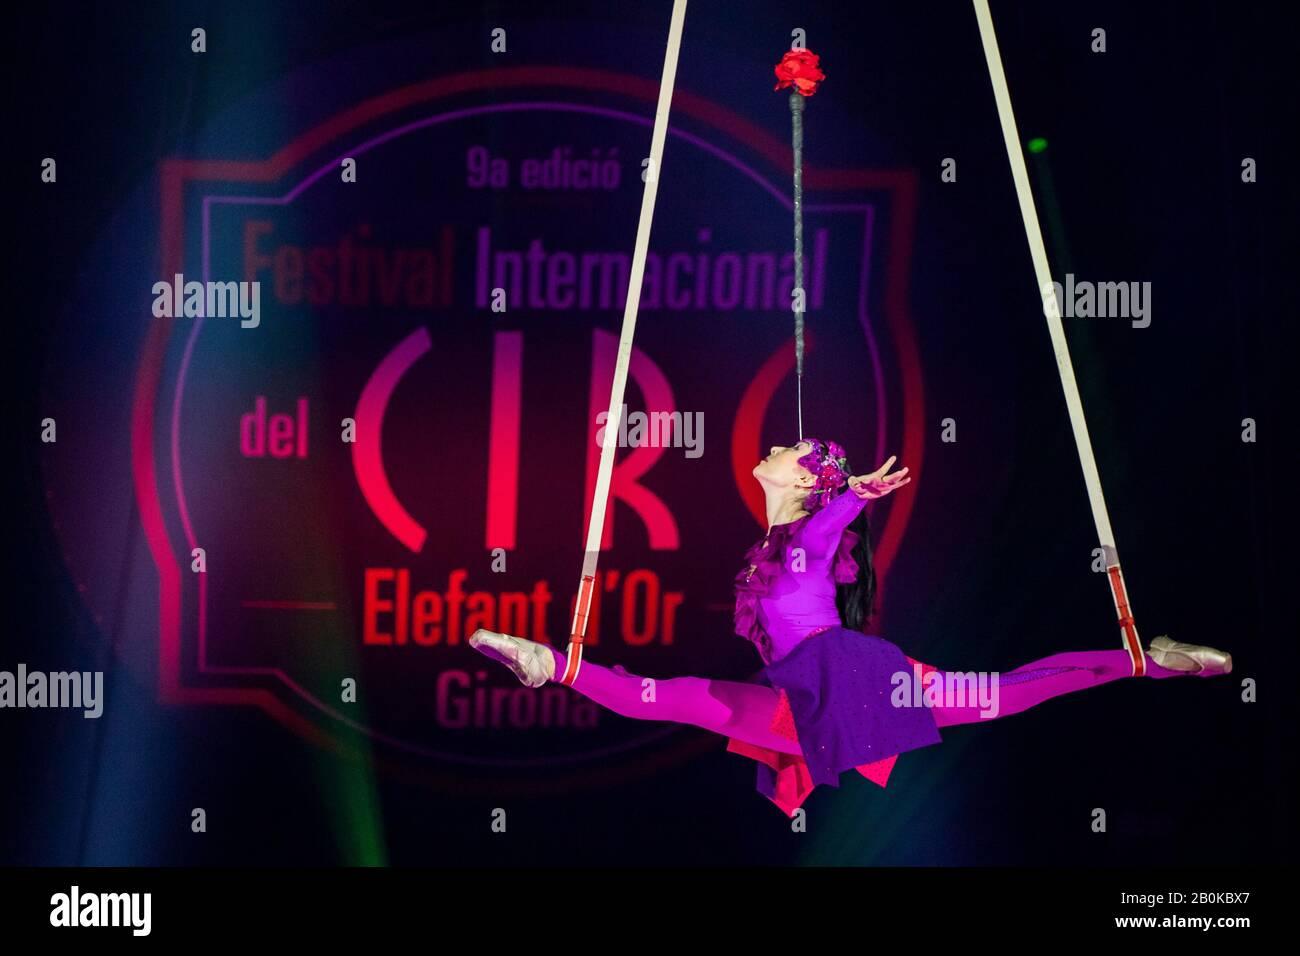 Girona, ESPAÑA - FEBRERO 17: Khorlan de Kazajstán realiza una escalera aérea durante el Festival Internacional de Circo 'Elefant d'Or' en el Parc de la Devesa o Foto de stock